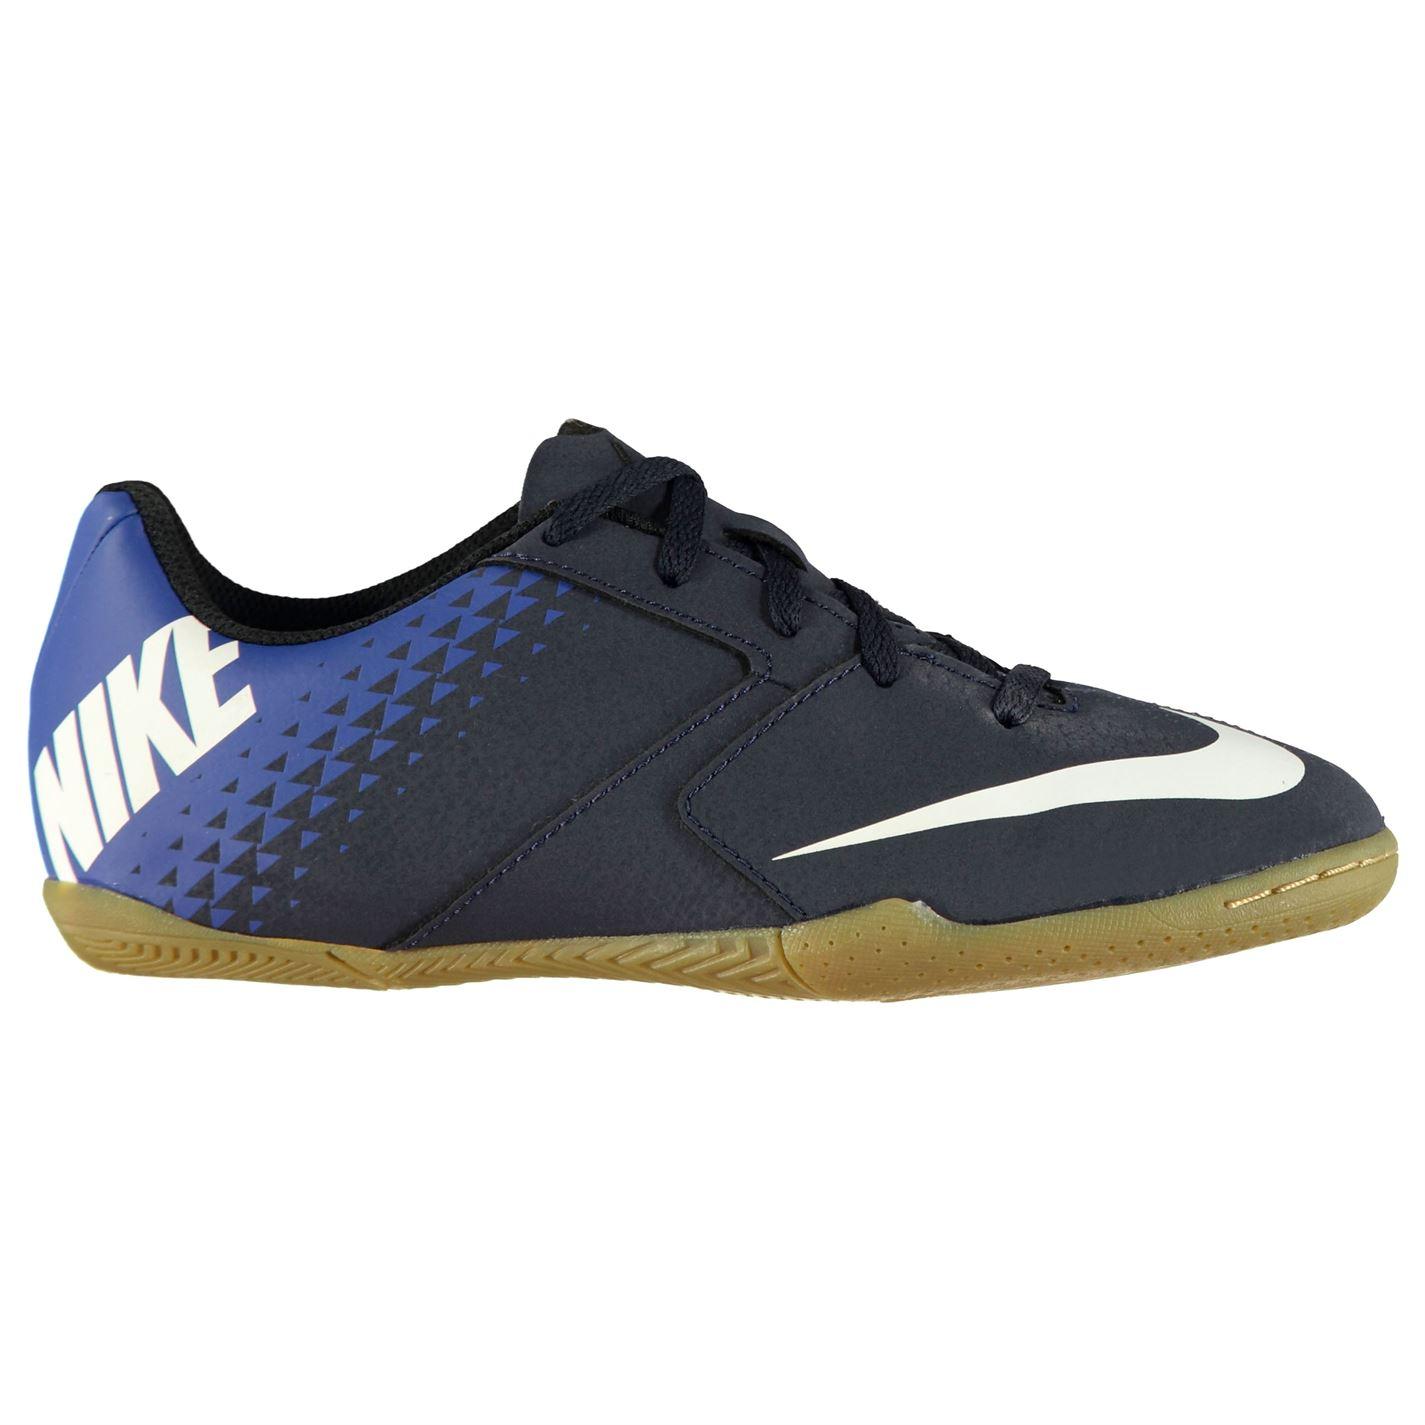 Nike Bomba X IC Junior Boys Indoor Football Trainers